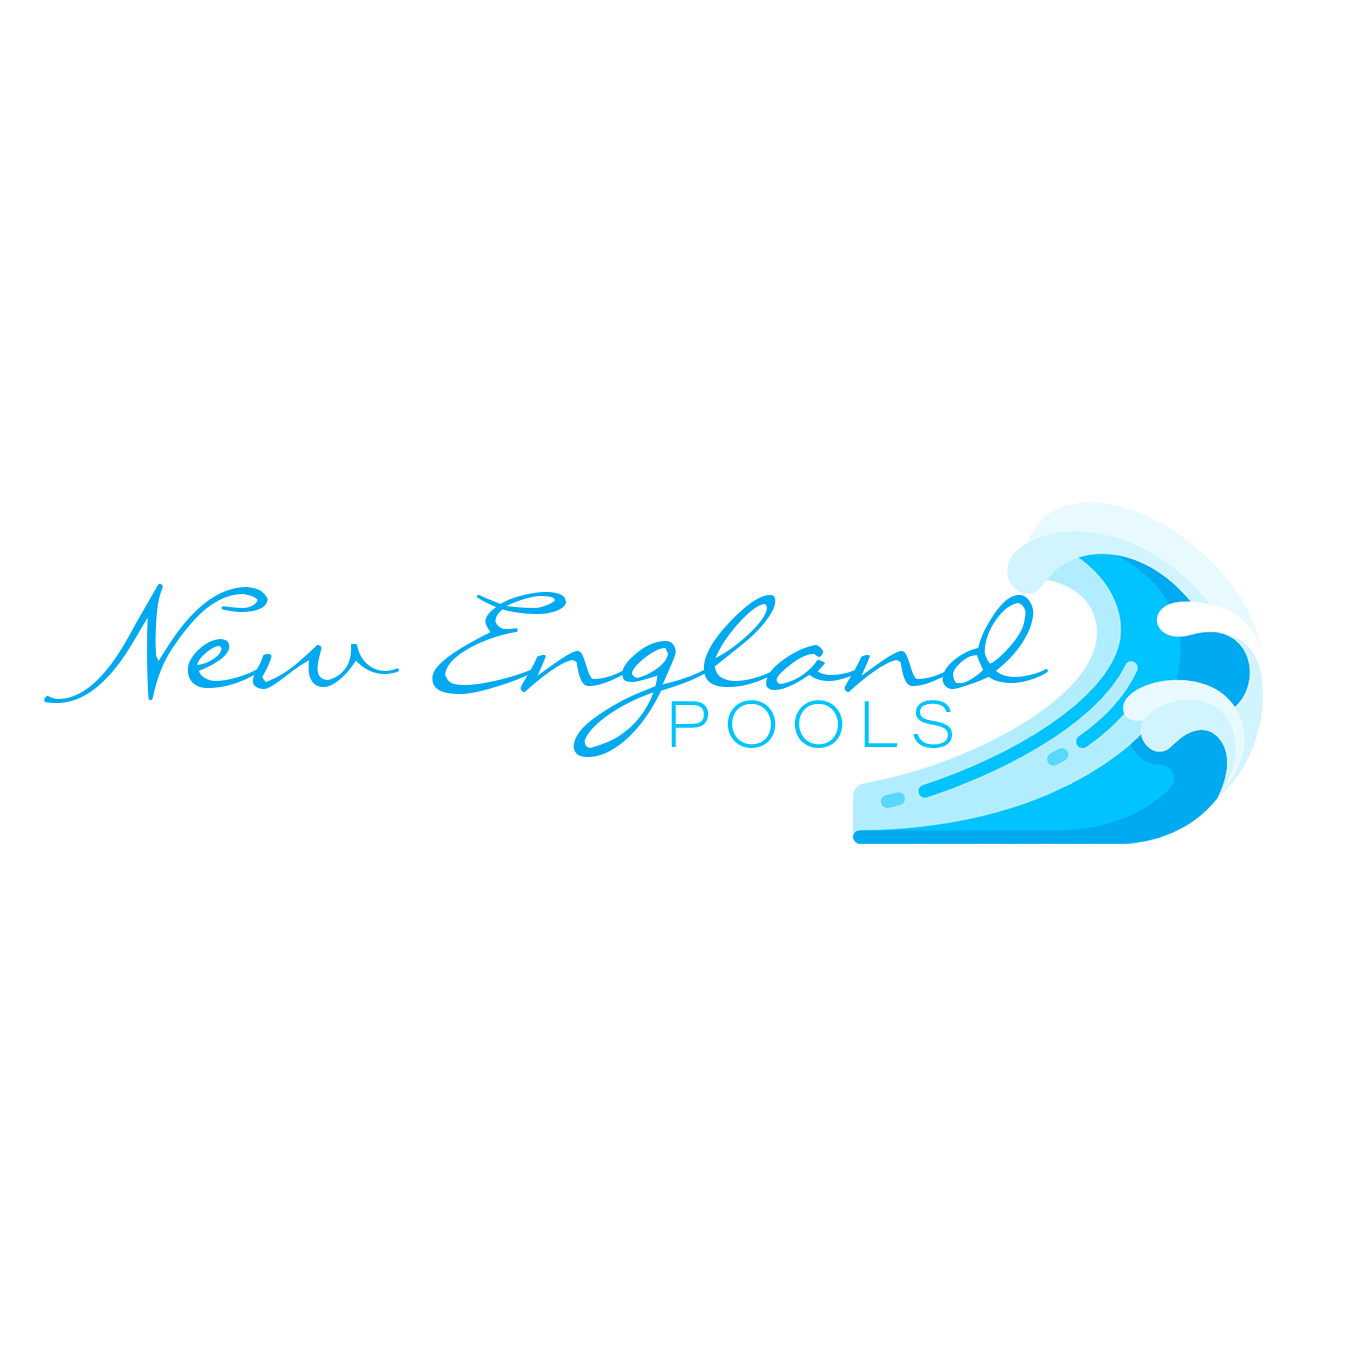 New England Pools